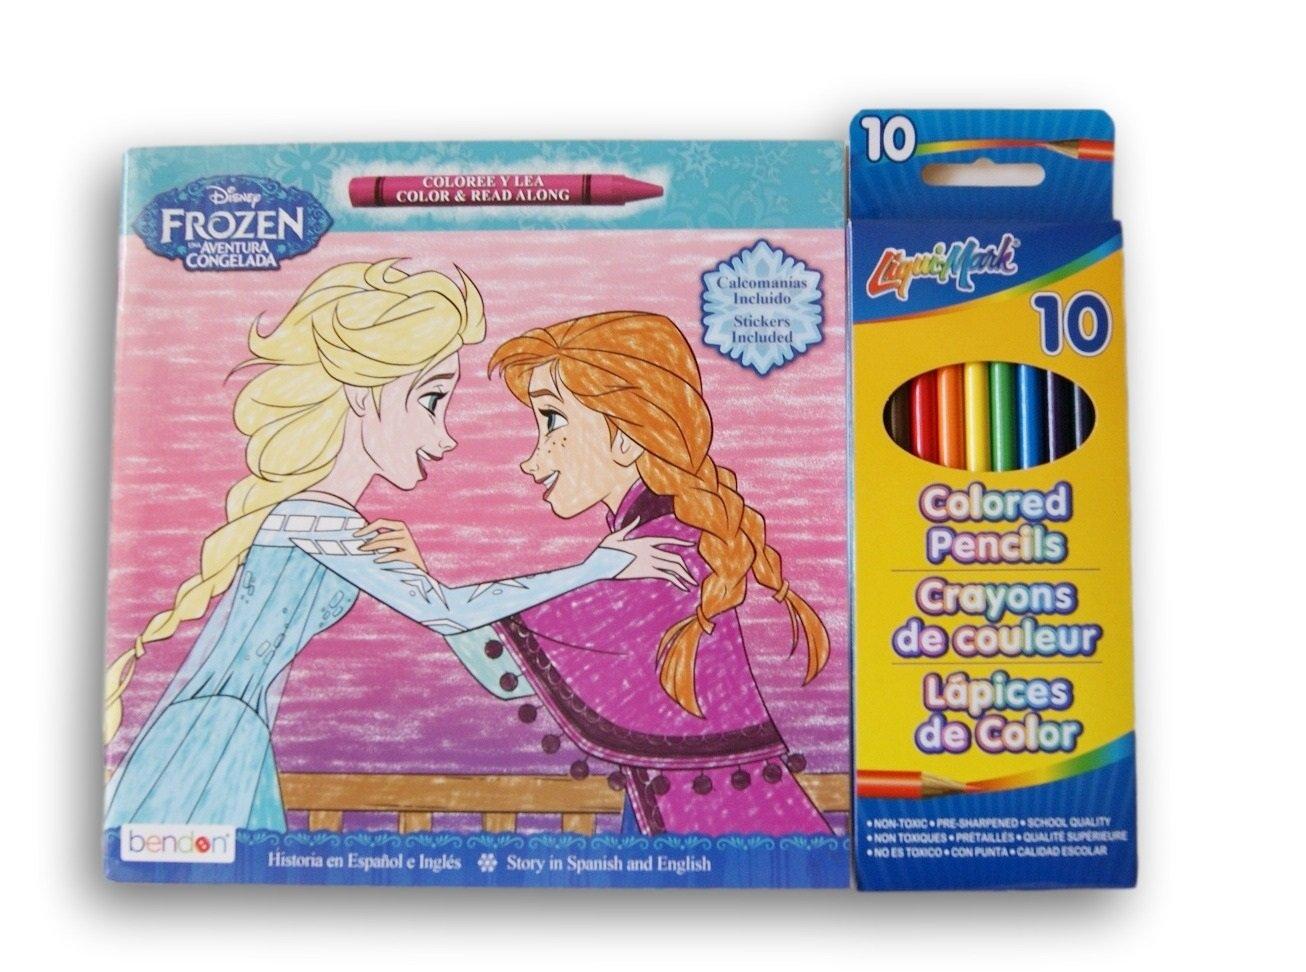 Disney Anna and Elsa Bilingual Coloring Set Color-and-Read Book and Colored Pencils Bendon